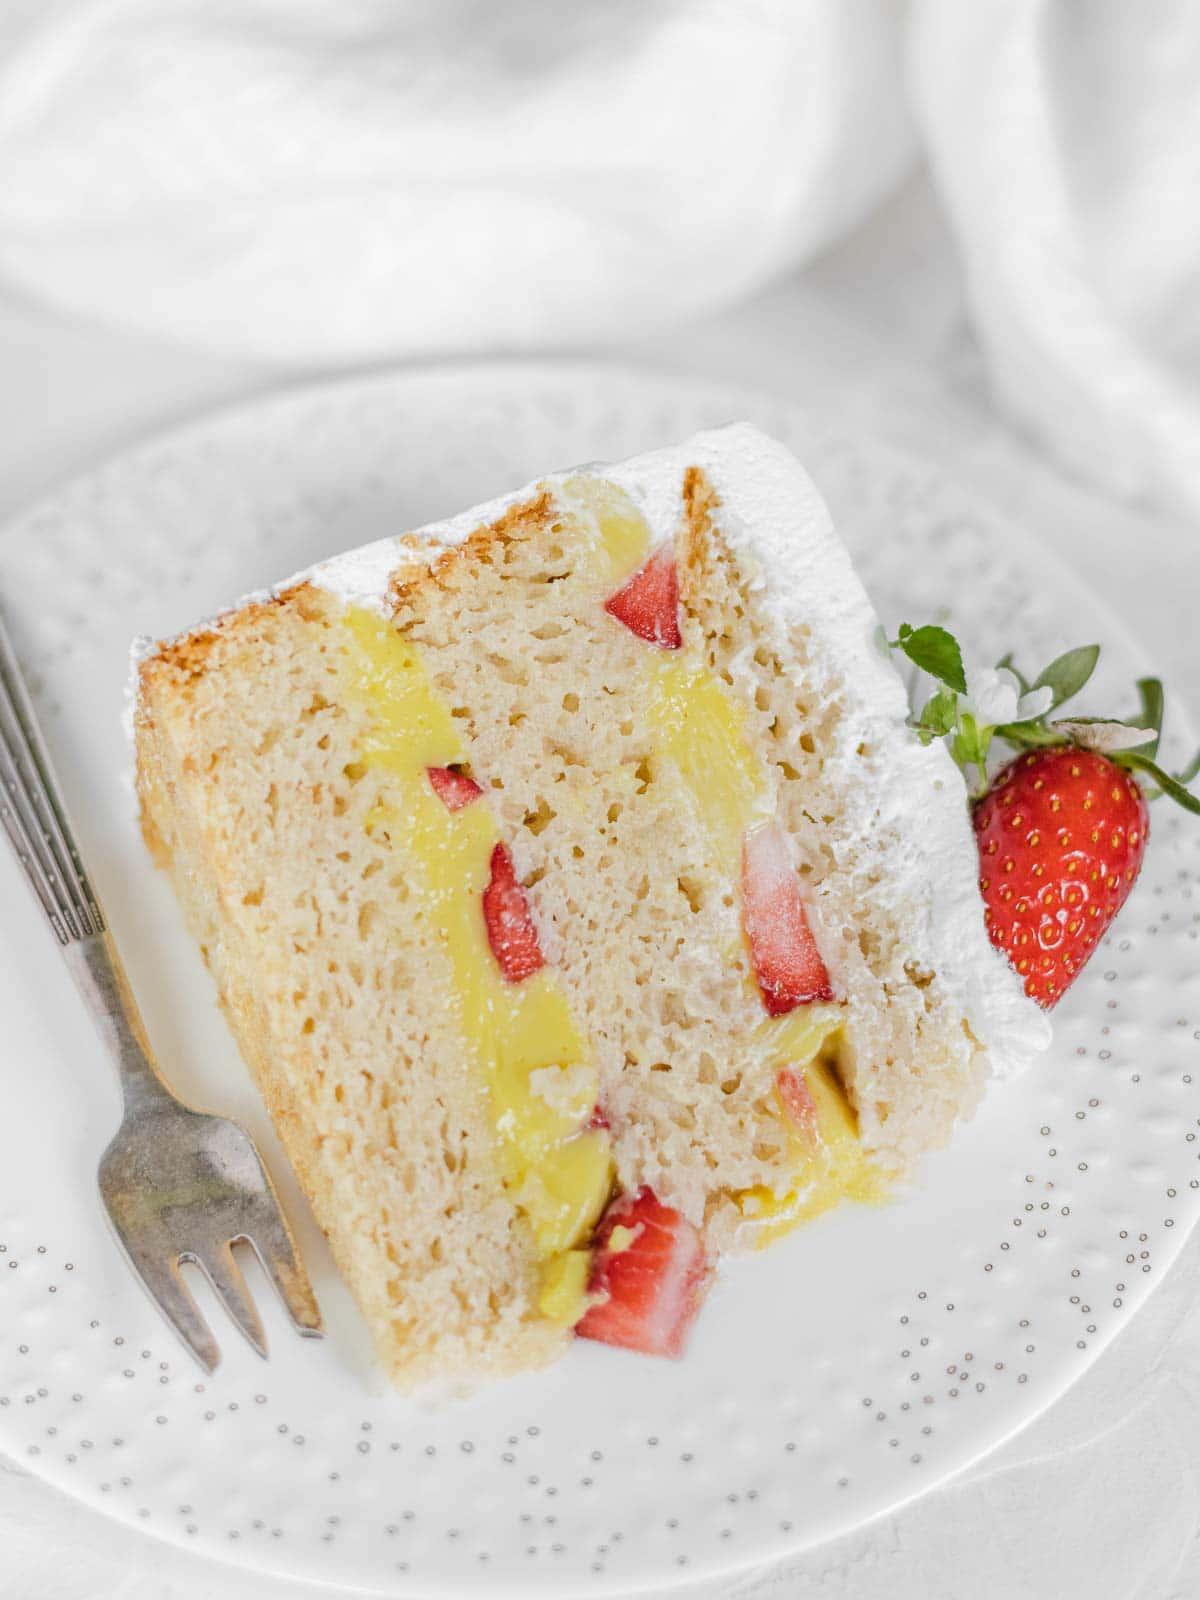 whole slice of vegan vanilla cake